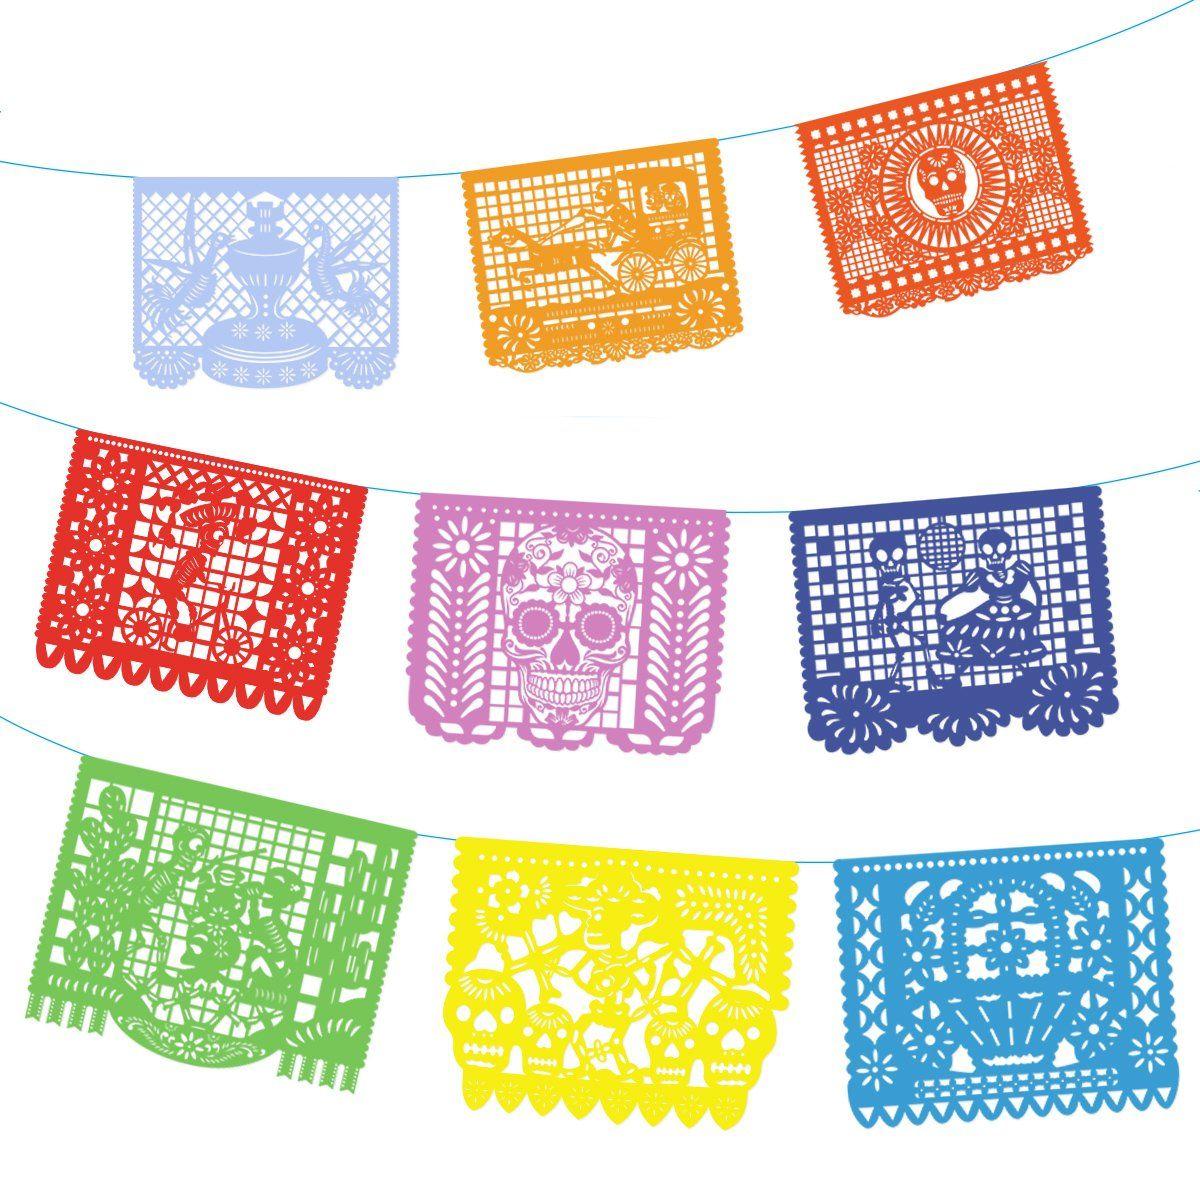 Fiesta Banners For Invite Papel Picado Mexicano Fondo Halloween Manualidades